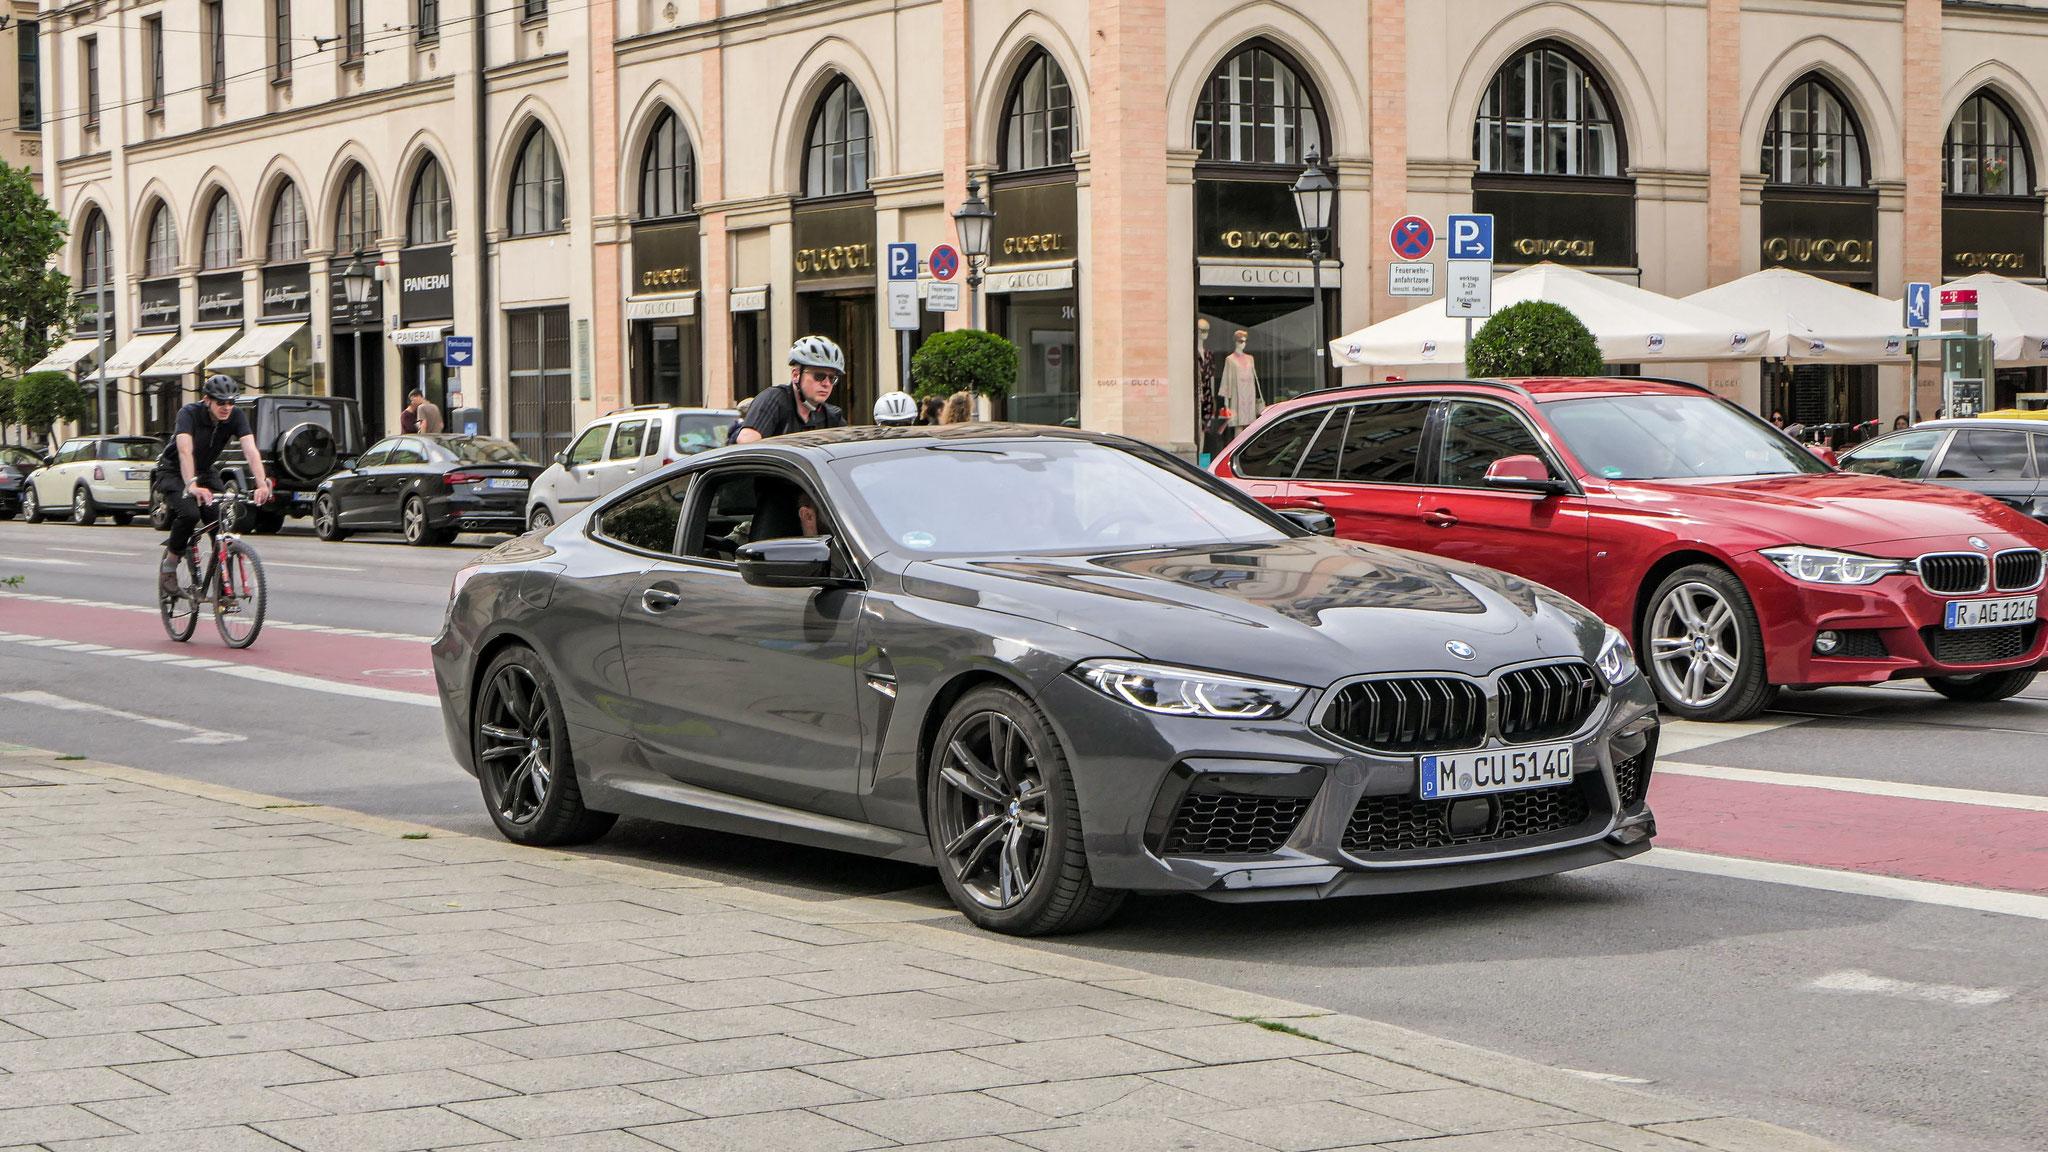 BMW M8 Competition - M-CU-5140